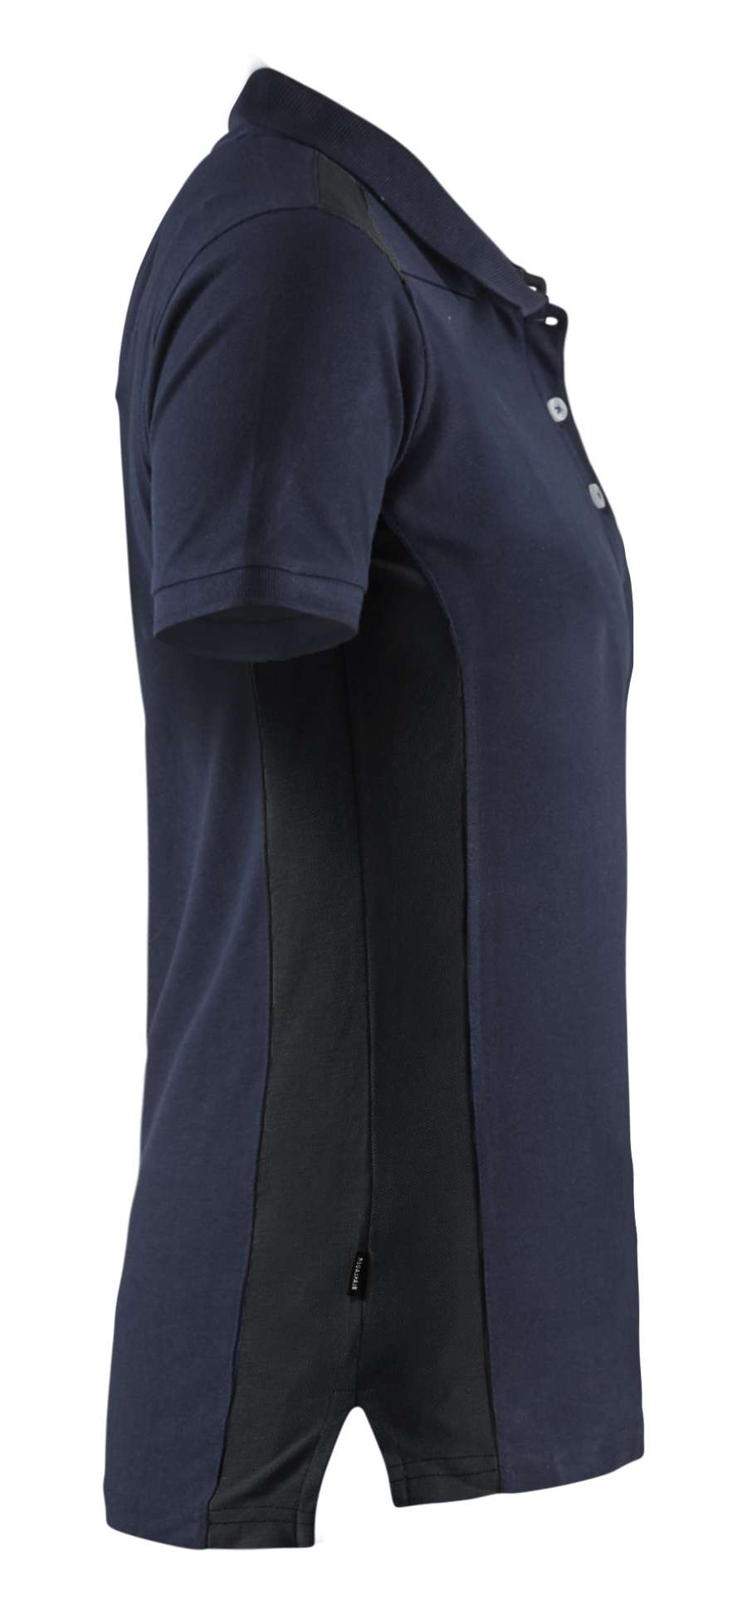 Blaklader Dames polo shirts 33901050 donker marineblauw-zwart(8699)